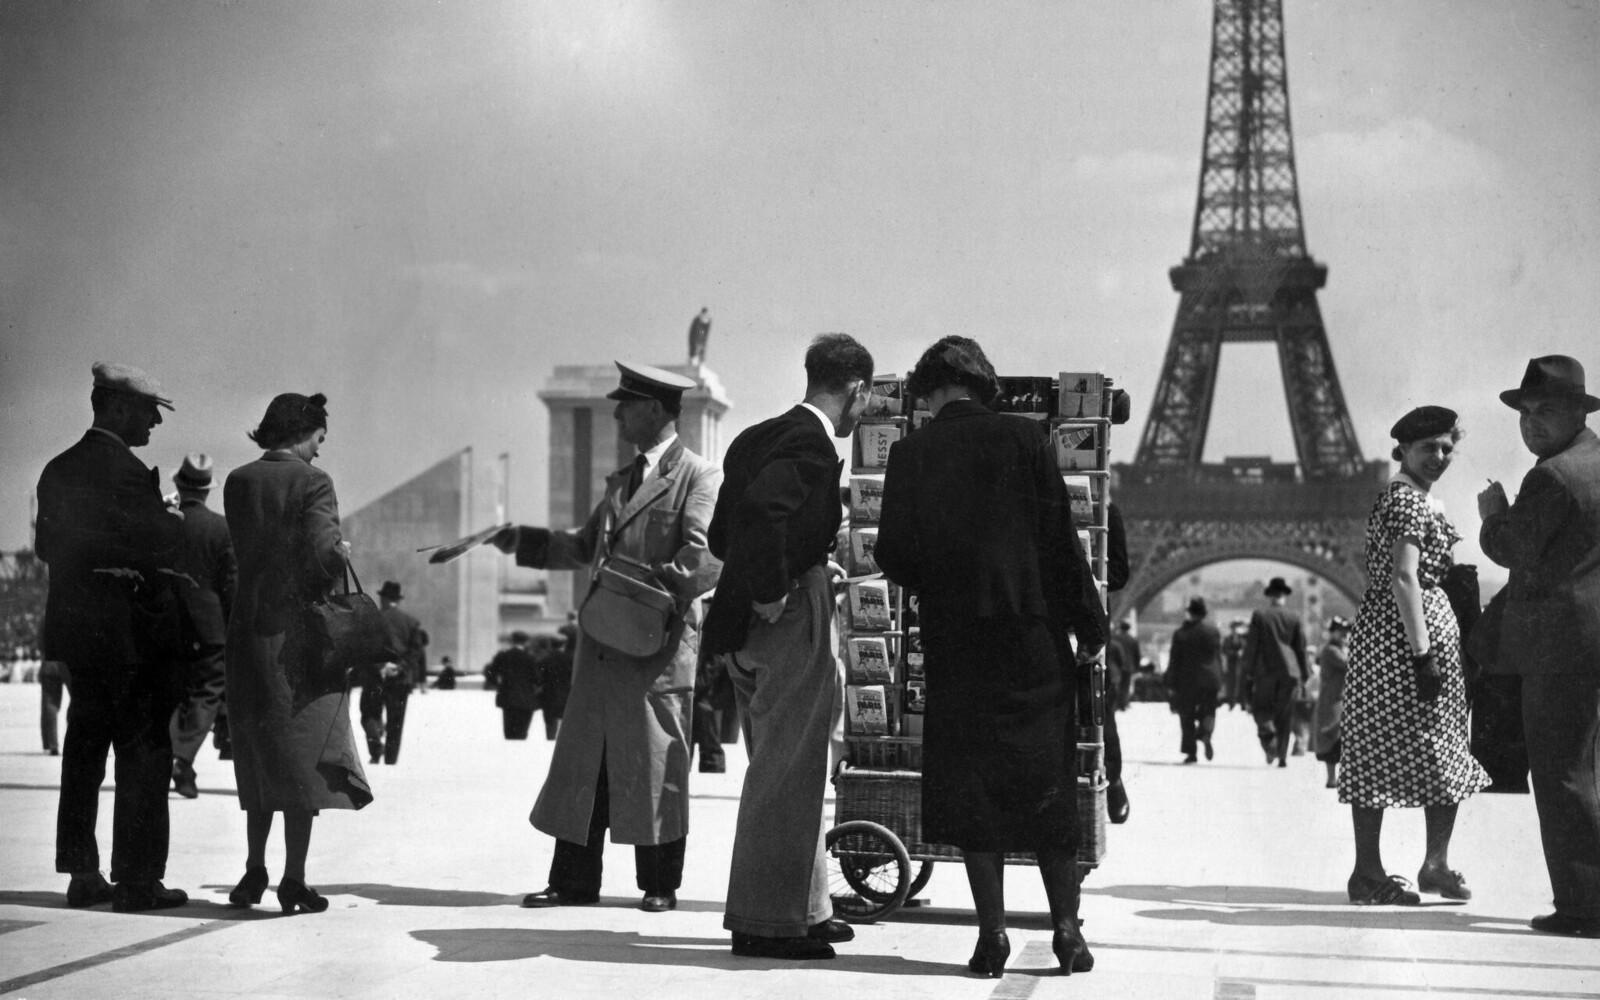 13. 1937. Туристы возле Эйфелевой башни